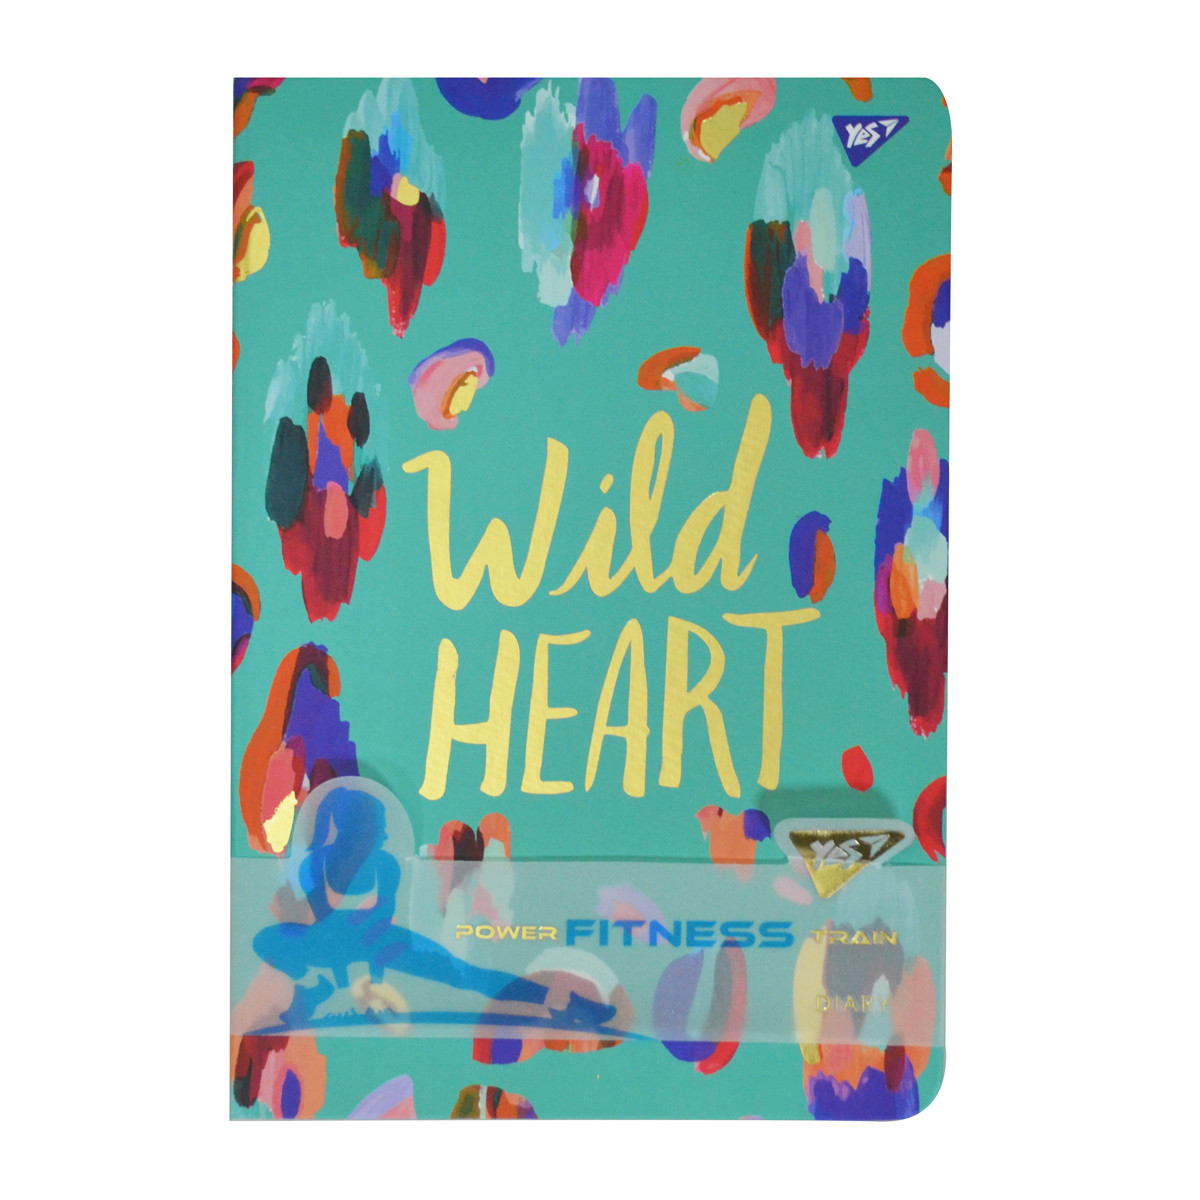 Блокнот-мотиватор YES Wild Heart серии Fitness, 140 х 210мм, 96л.      код: 151581